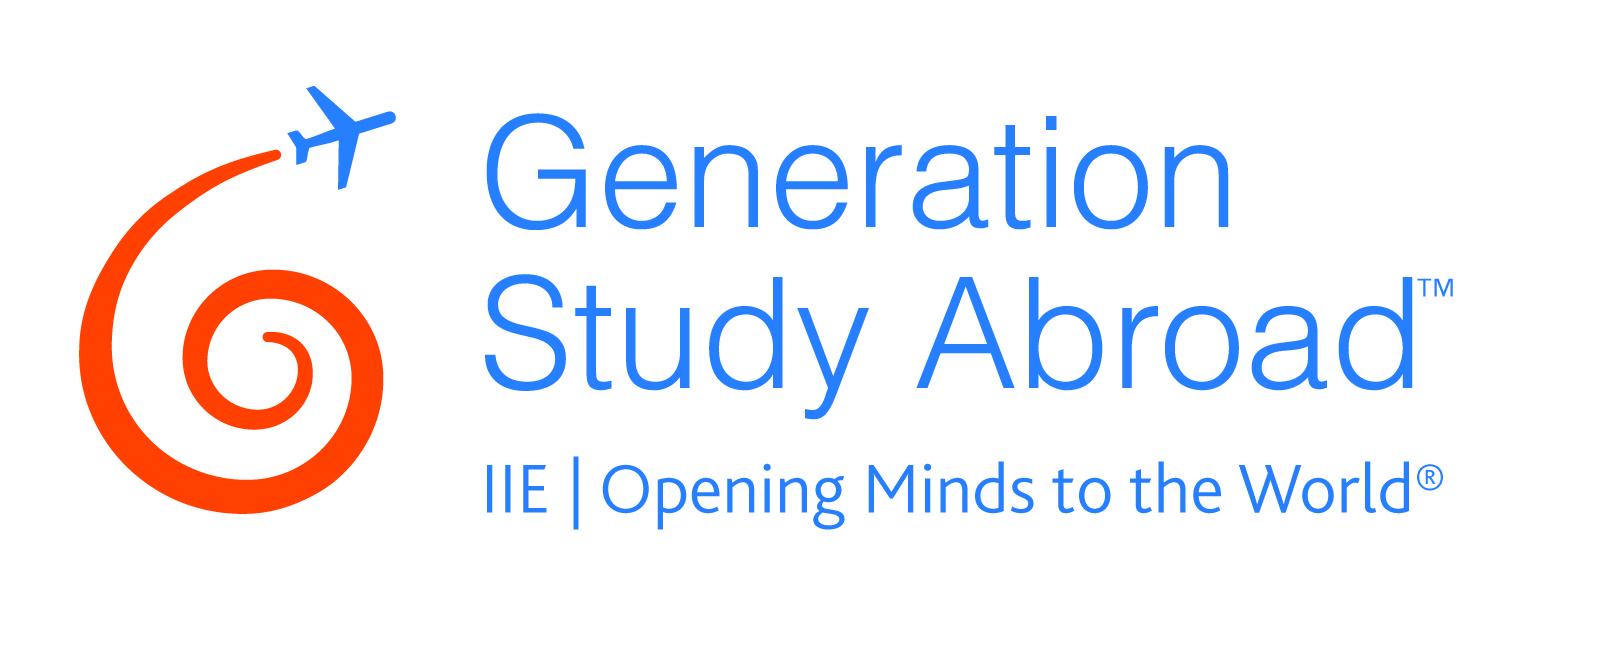 generation-study-abroad-2.jpg